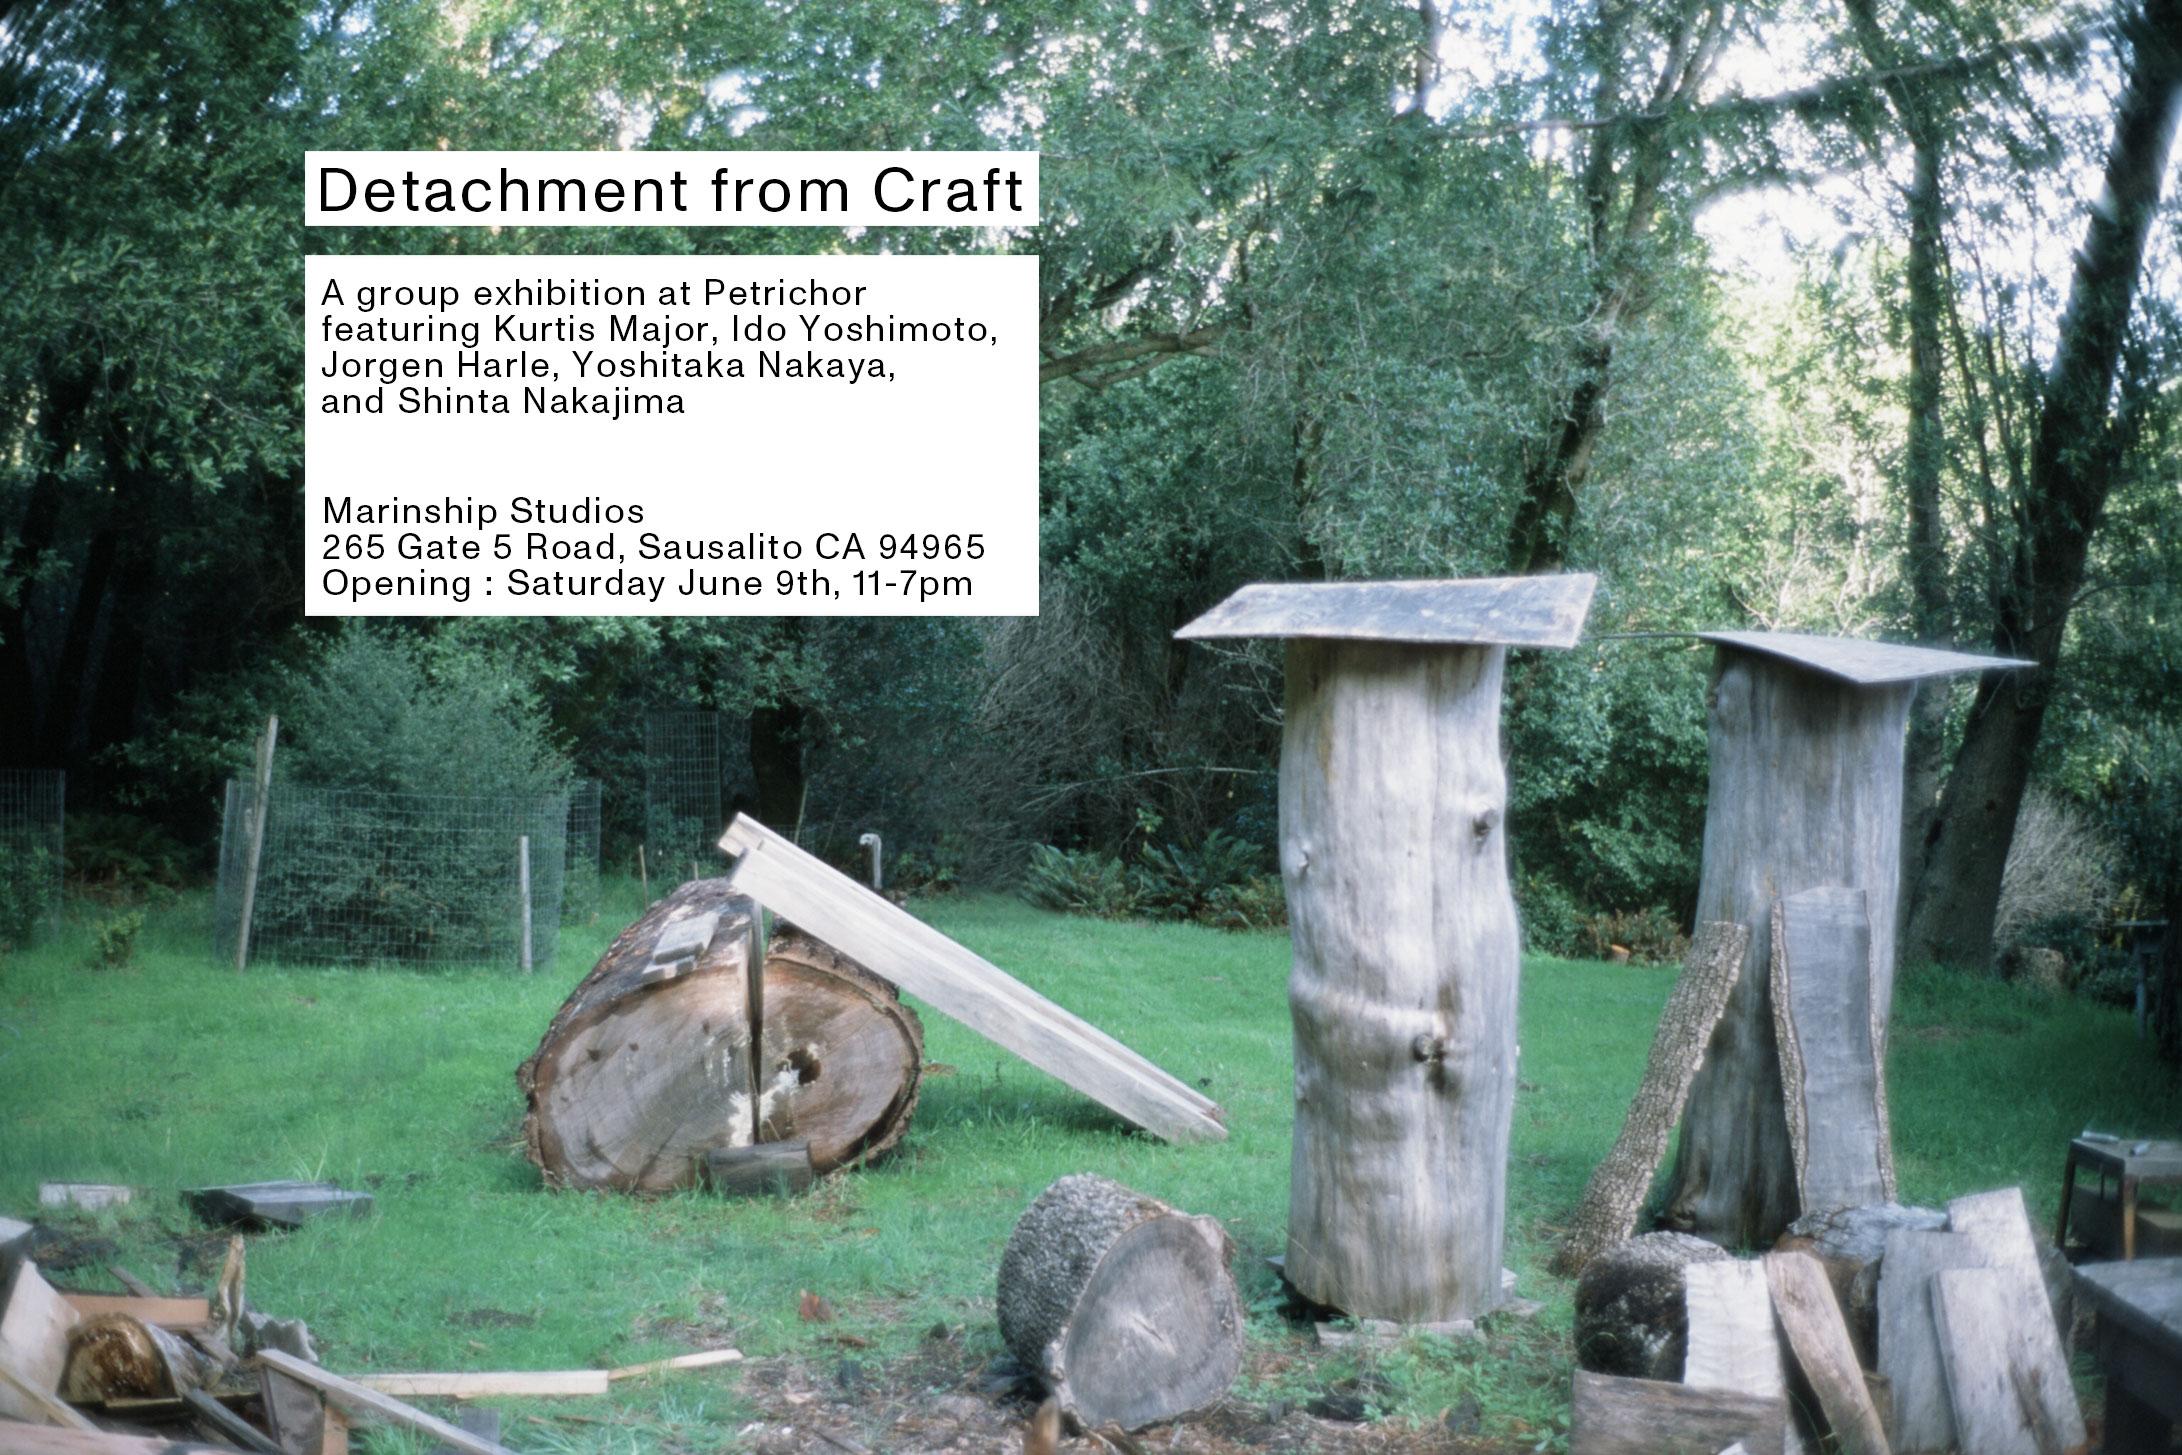 detachment_from_craft-2x3.jpg